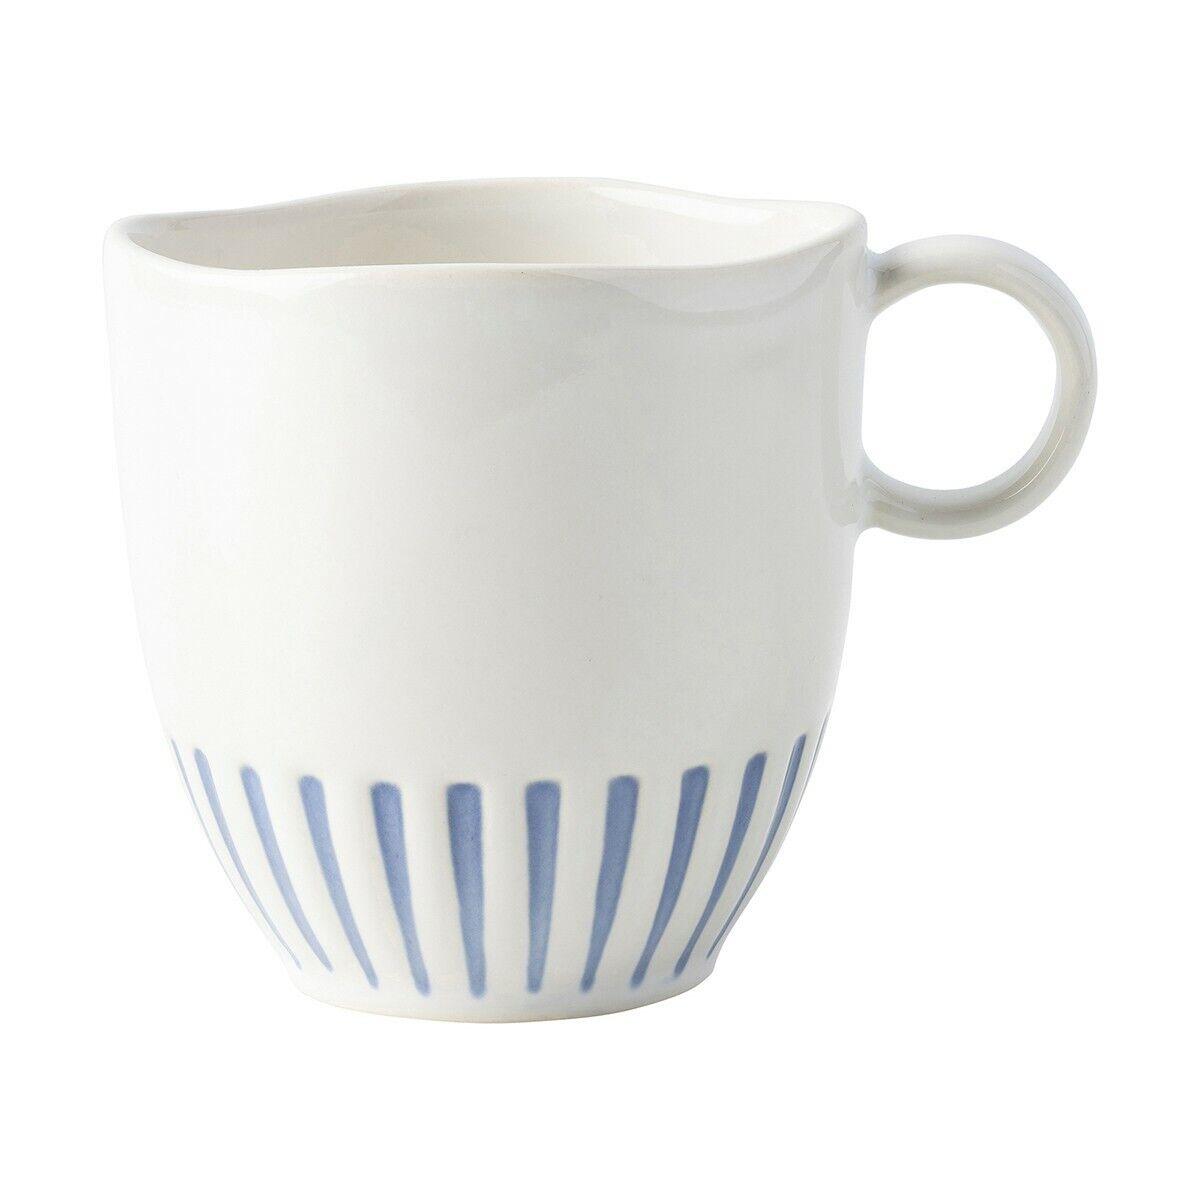 Juliska Sitio Stripe Indigo Mug - Set of 12